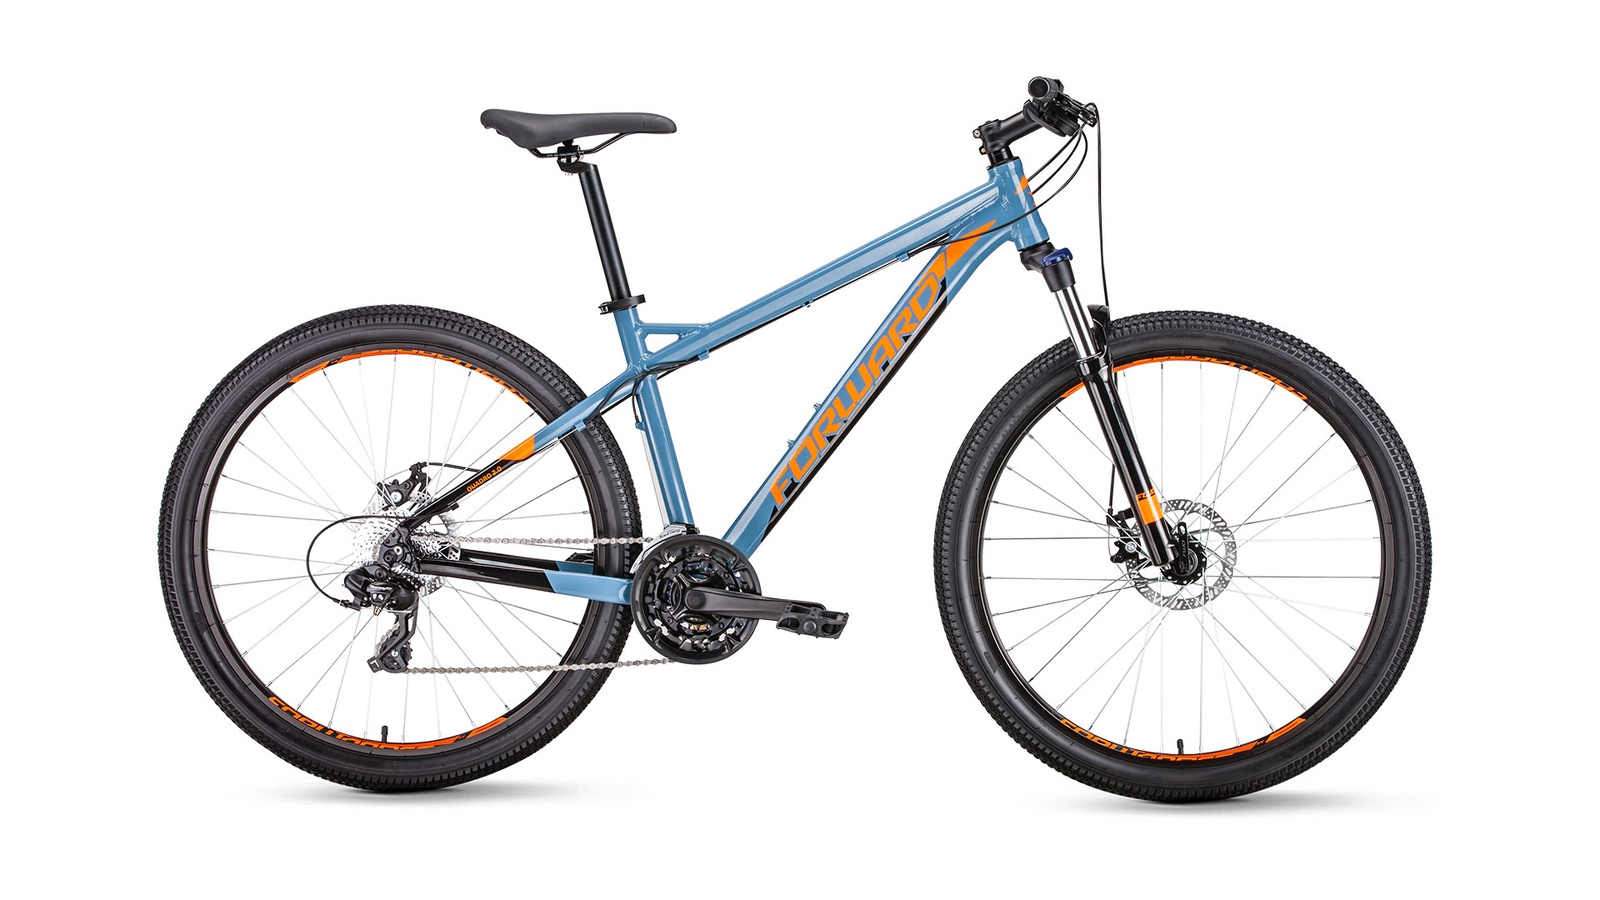 цена на Велосипед Forward Quadro 27,5 2.0 disc, серый